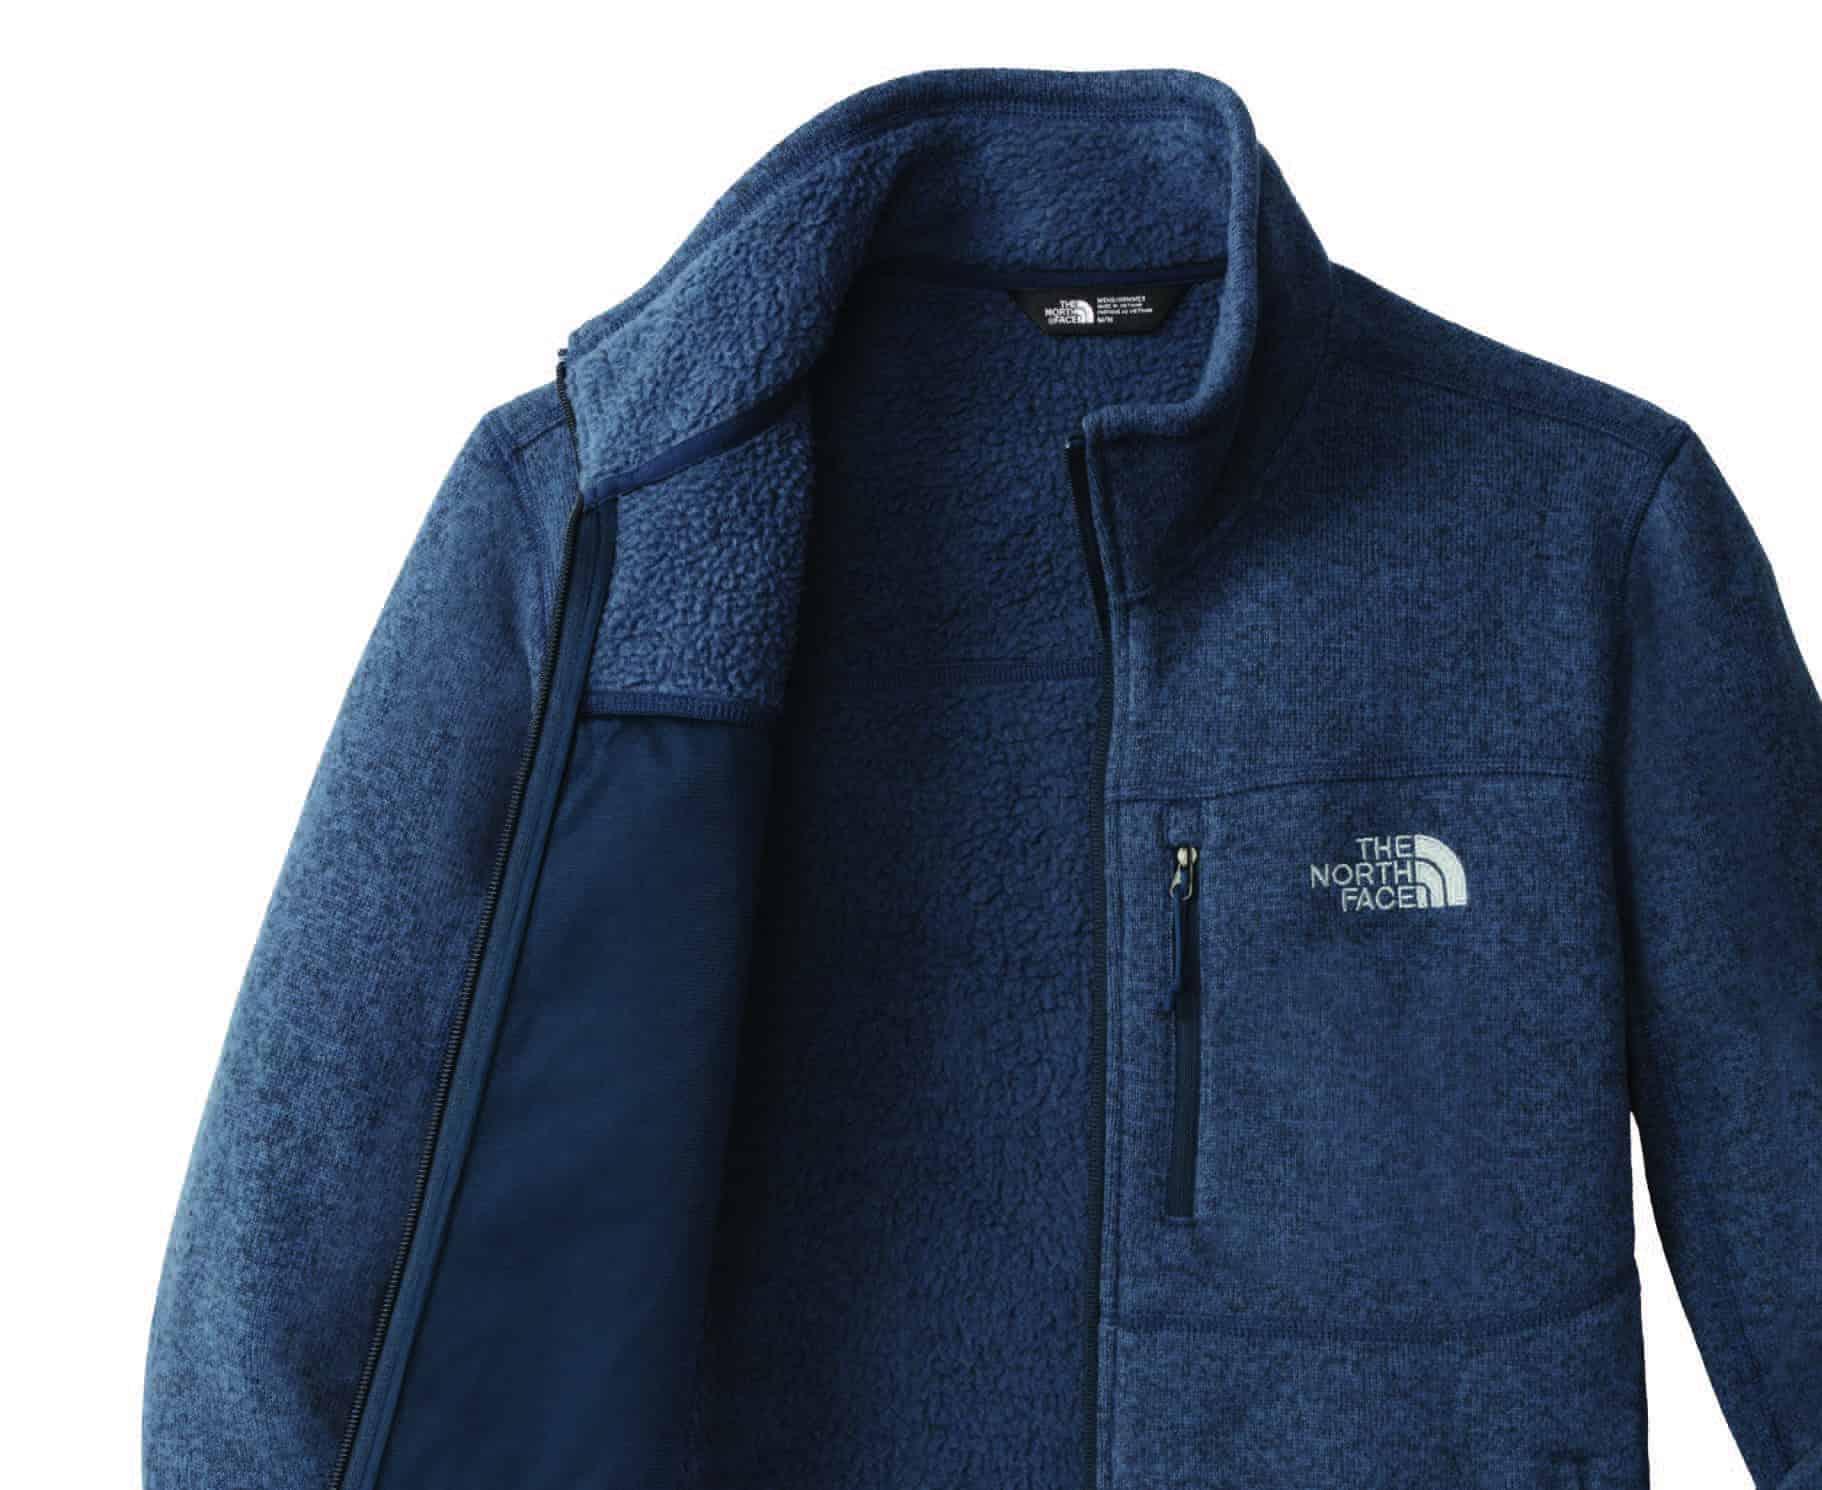 Custom North Face Jackets – Sweater Fleece